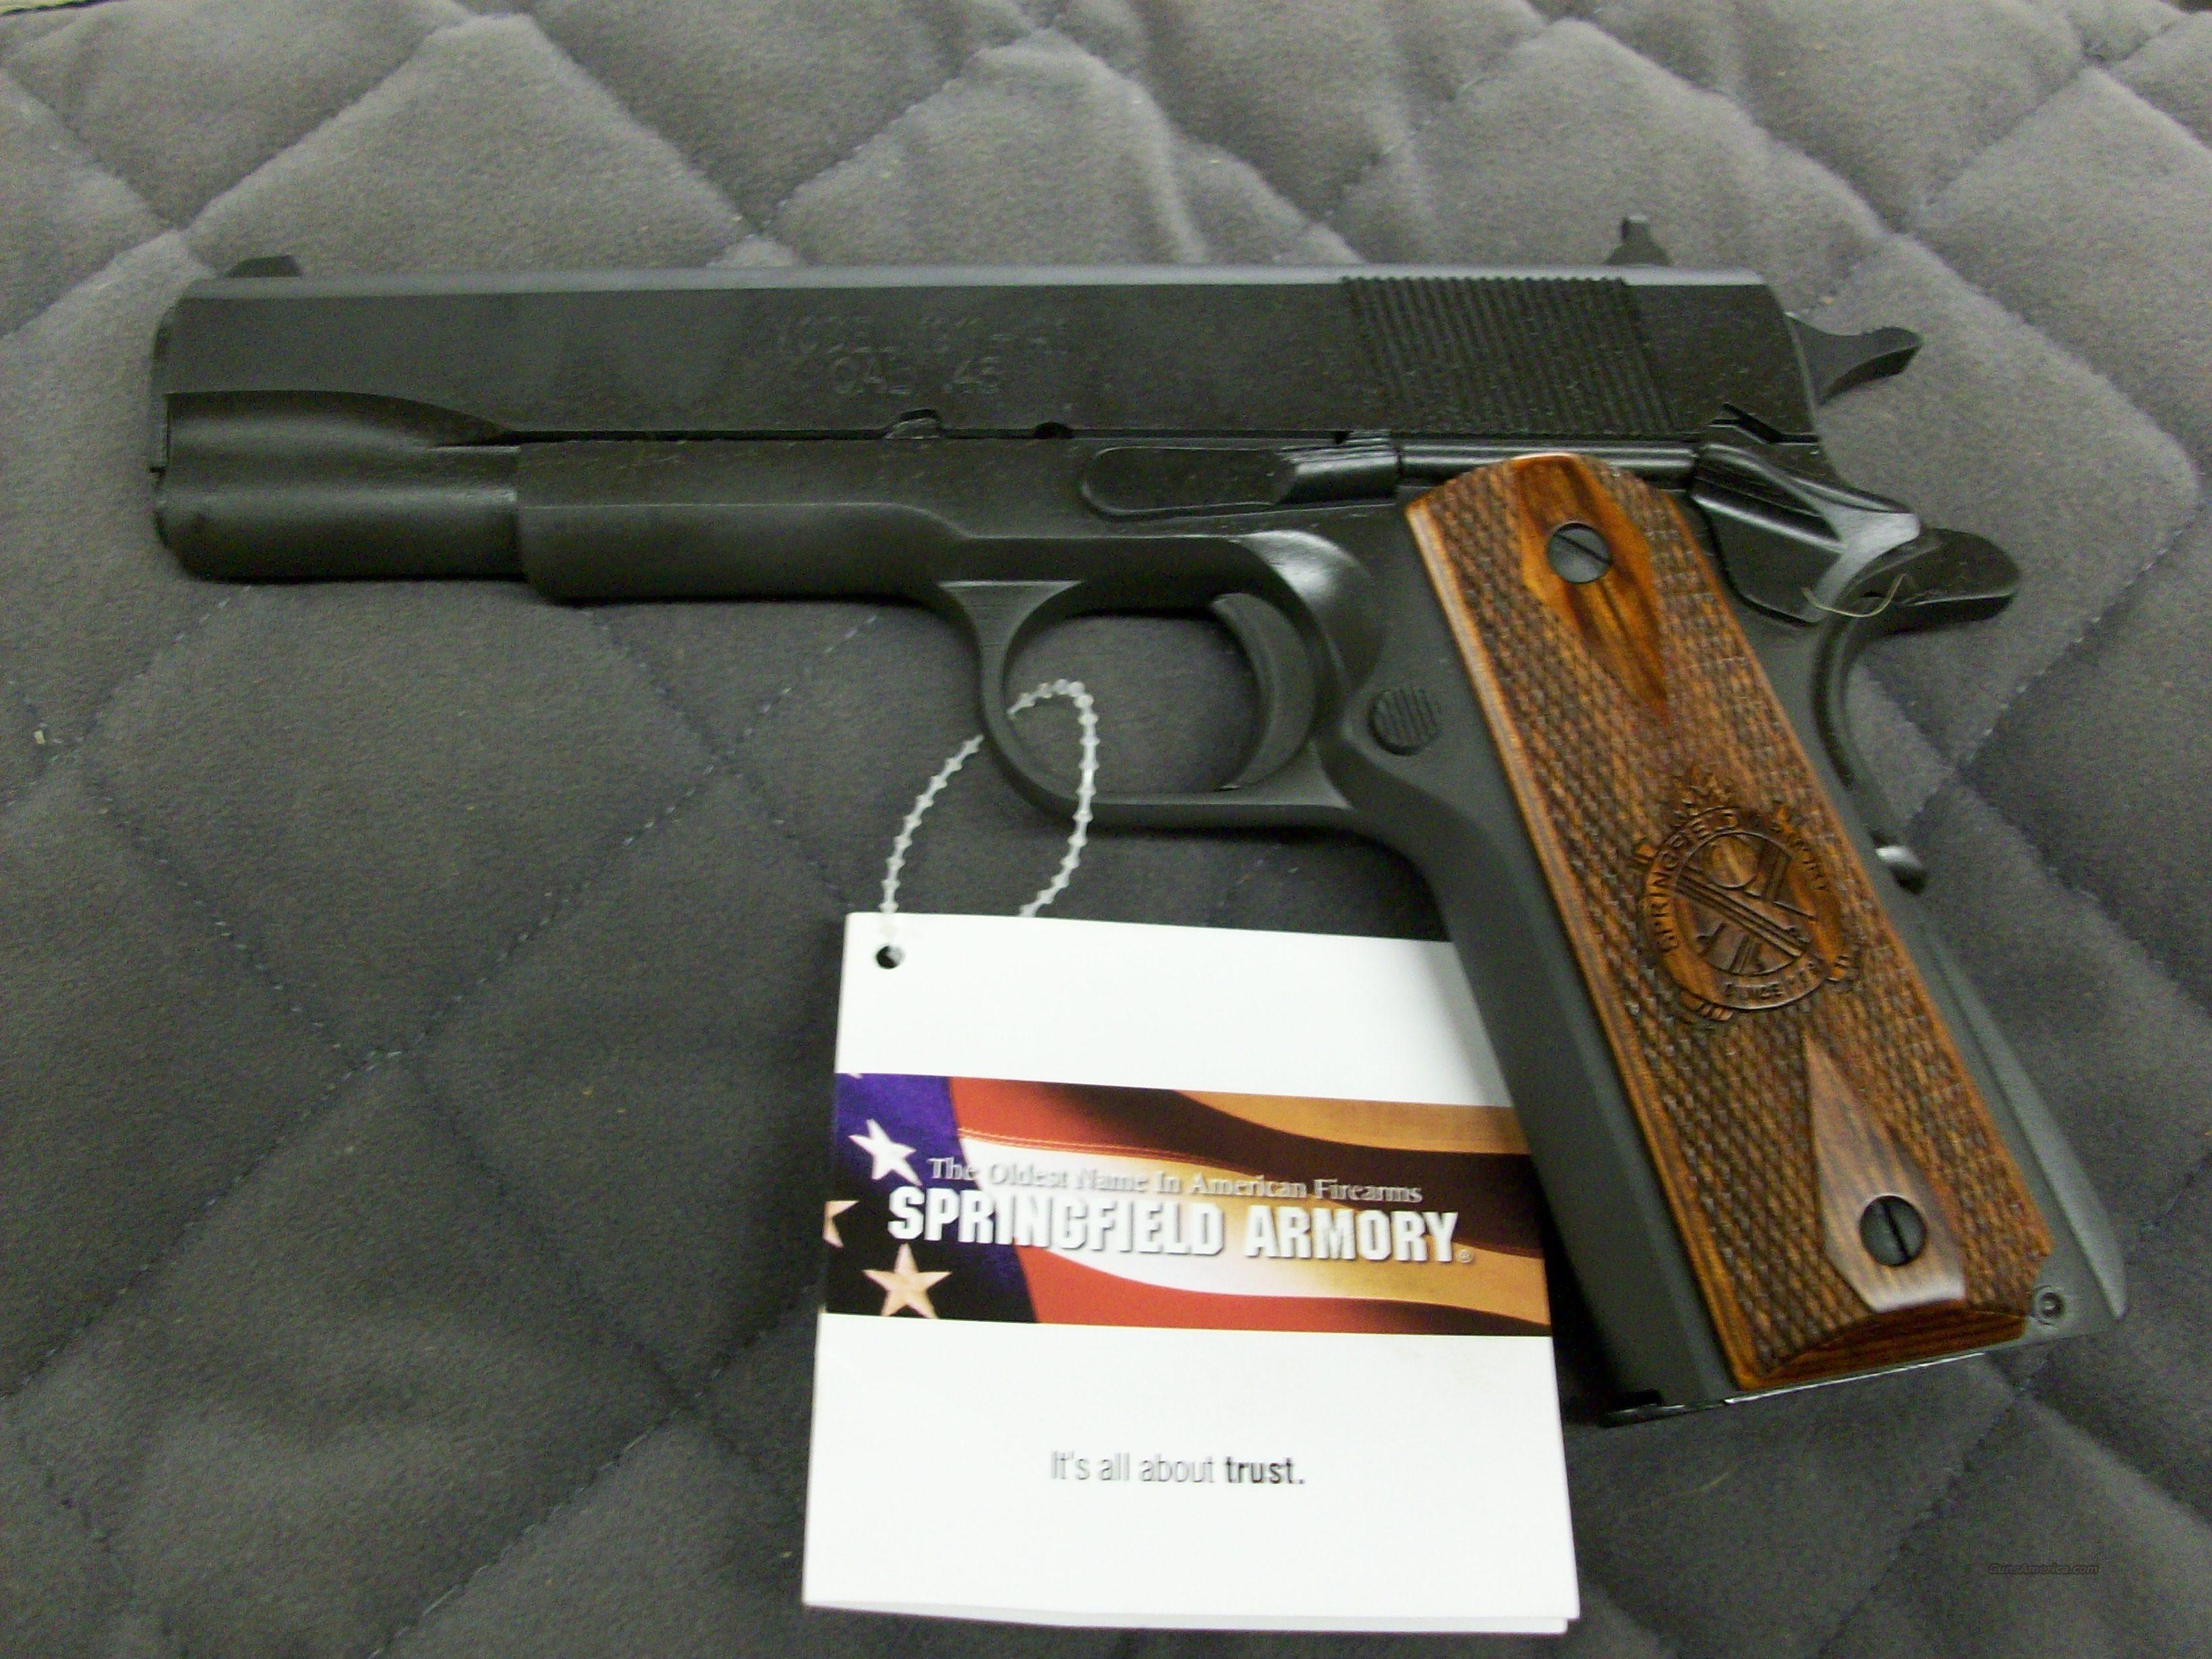 Springfield 1911 A1 Mil-Spec 45 ACP  **NEW**  Guns > Pistols > Springfield Armory Pistols > 1911 Type